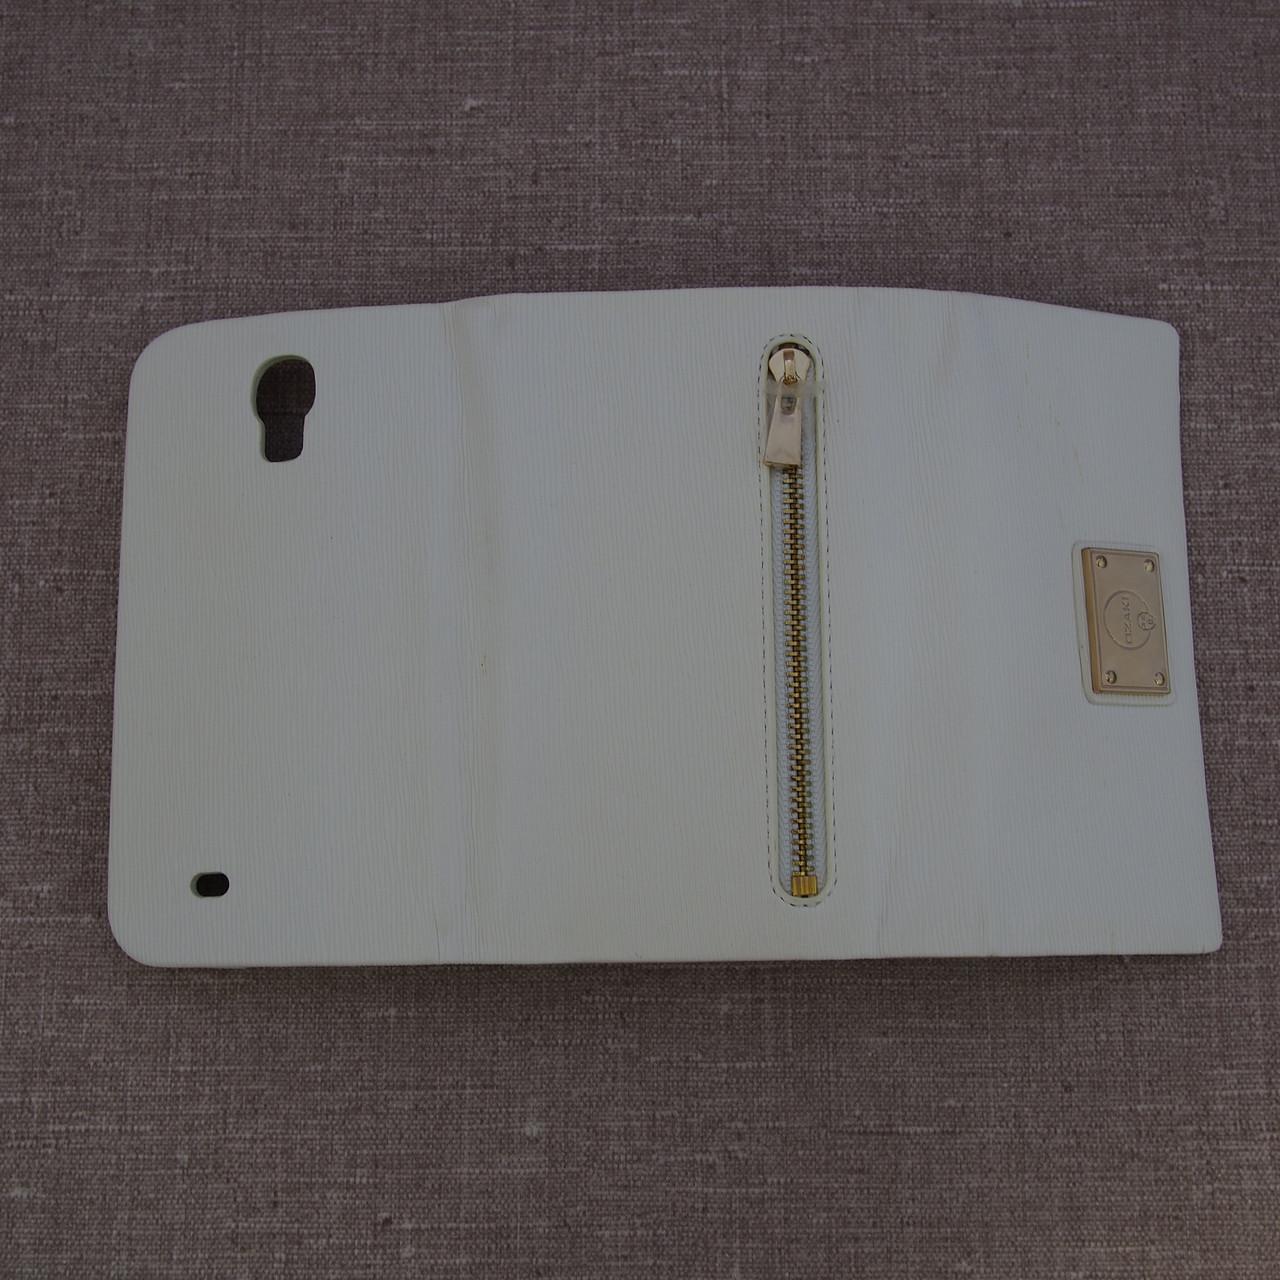 Ozaki O!Coat Zippy Samsung Galaxy S4 white